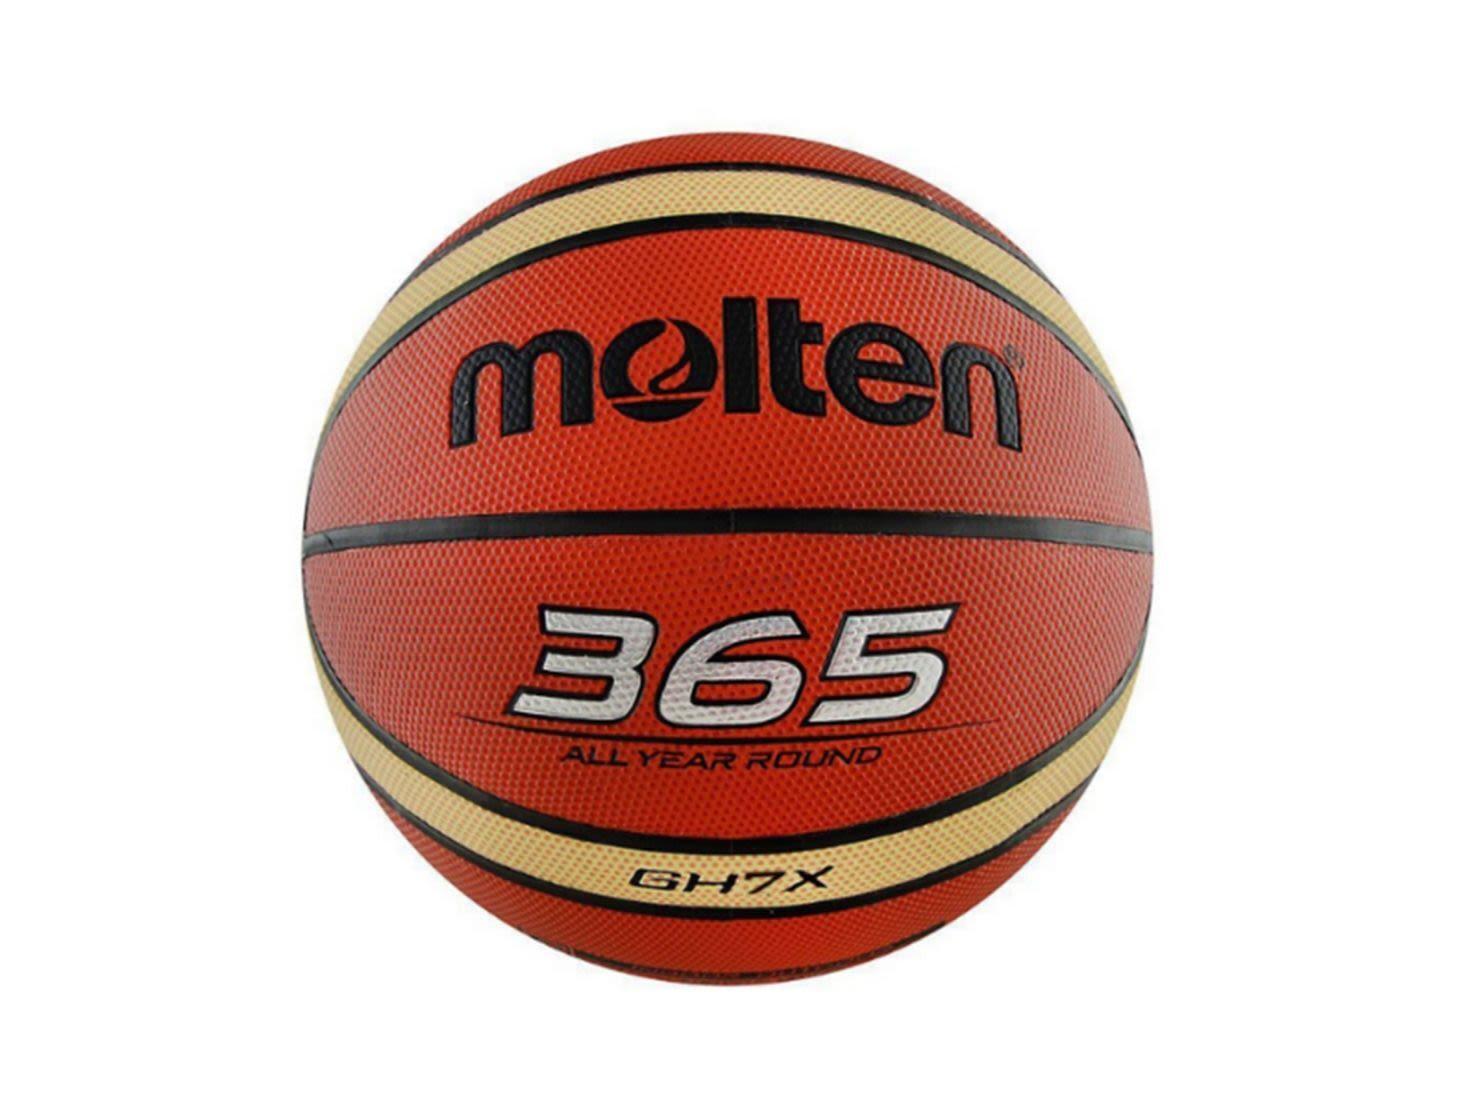 Balon Basket Molten GHX7 y GH5X